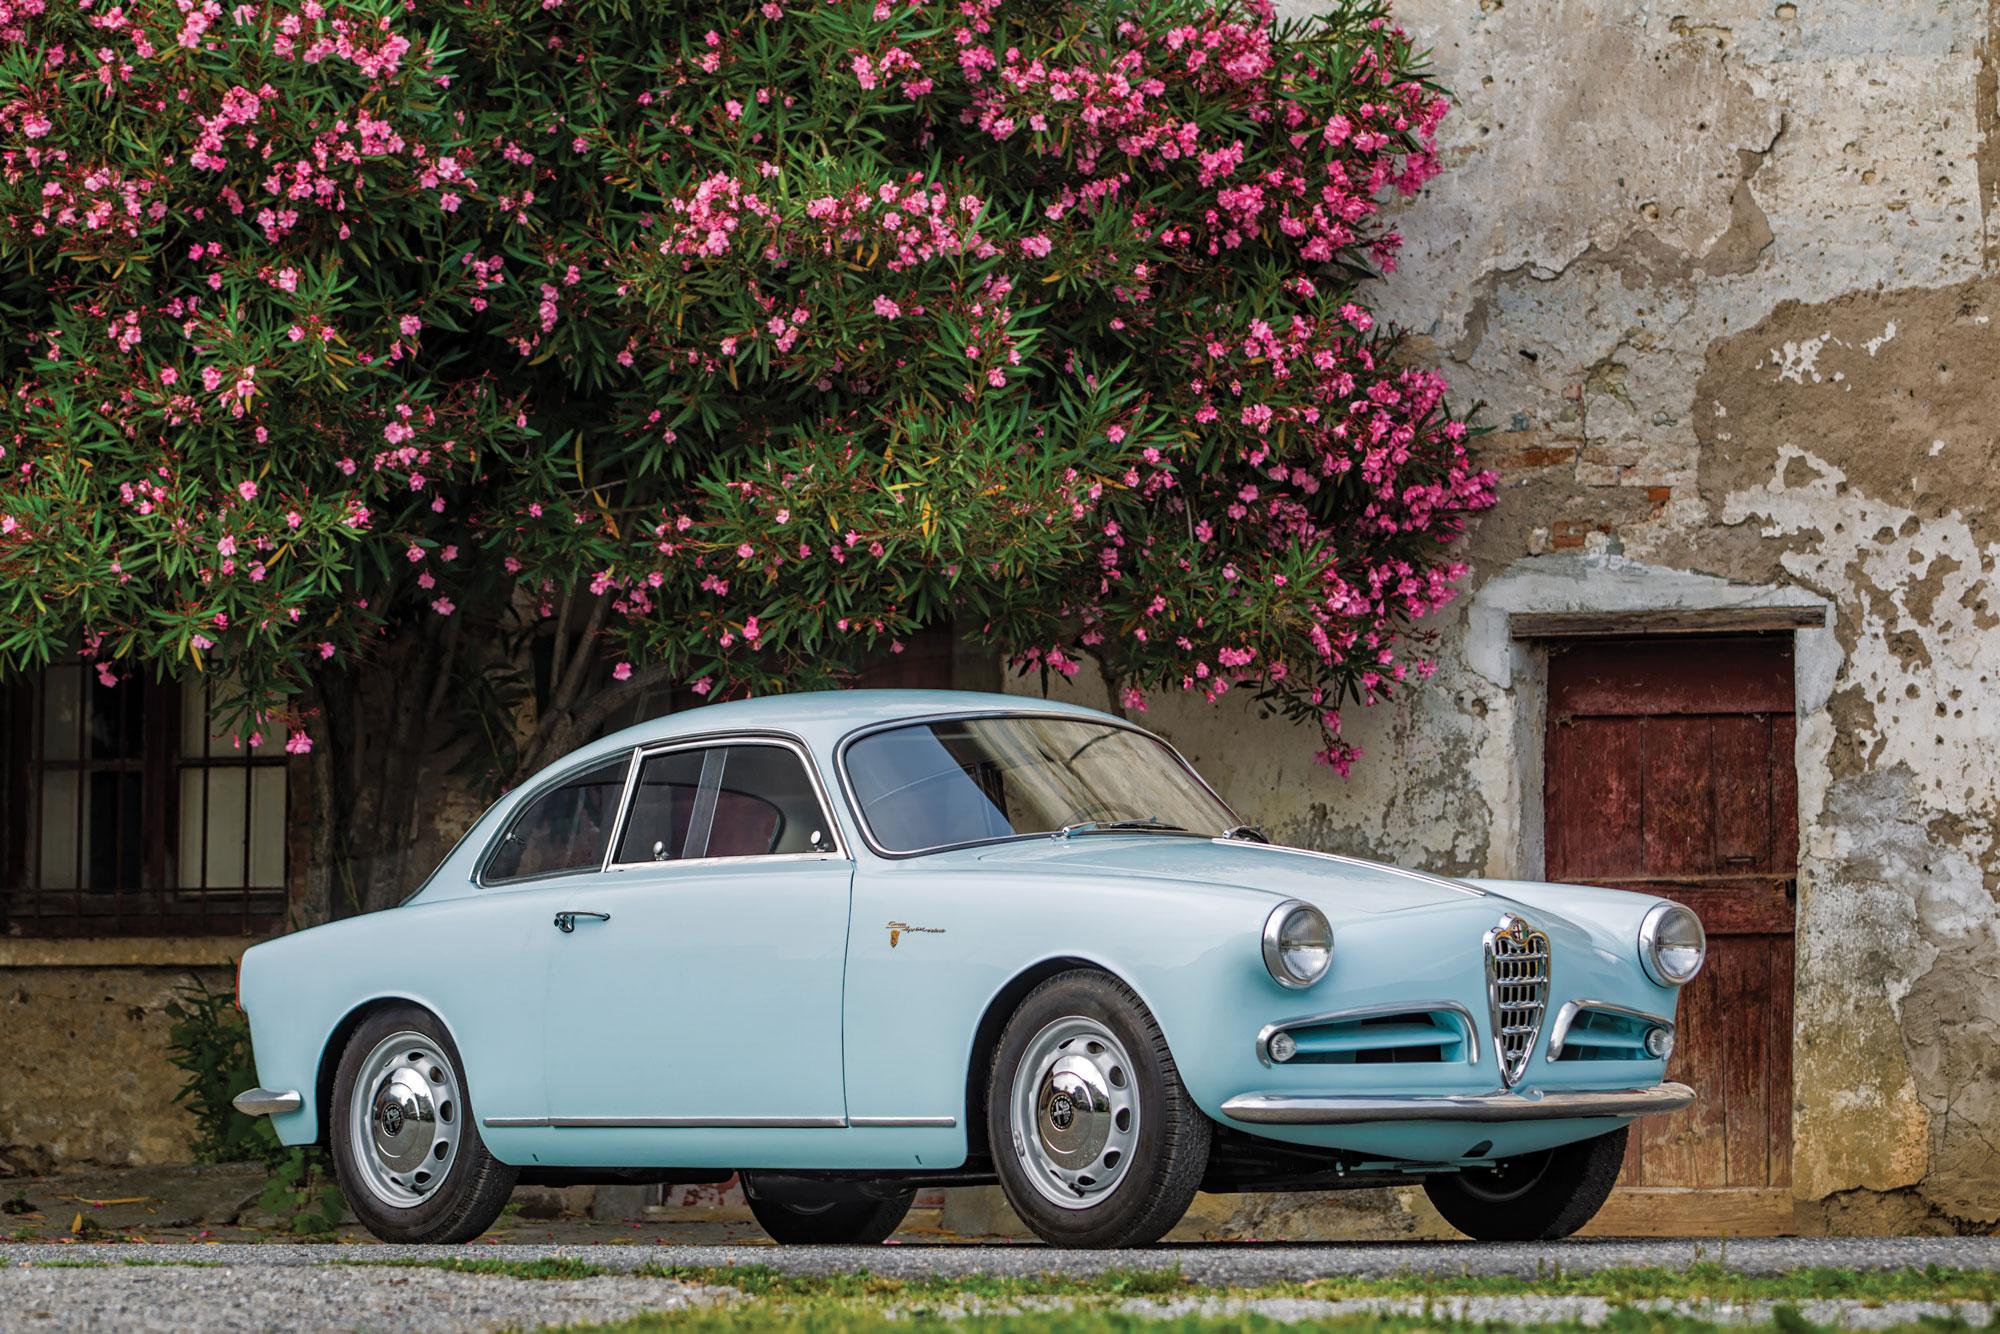 1957 Alfa Romeo Giulietta SV Alleggerita